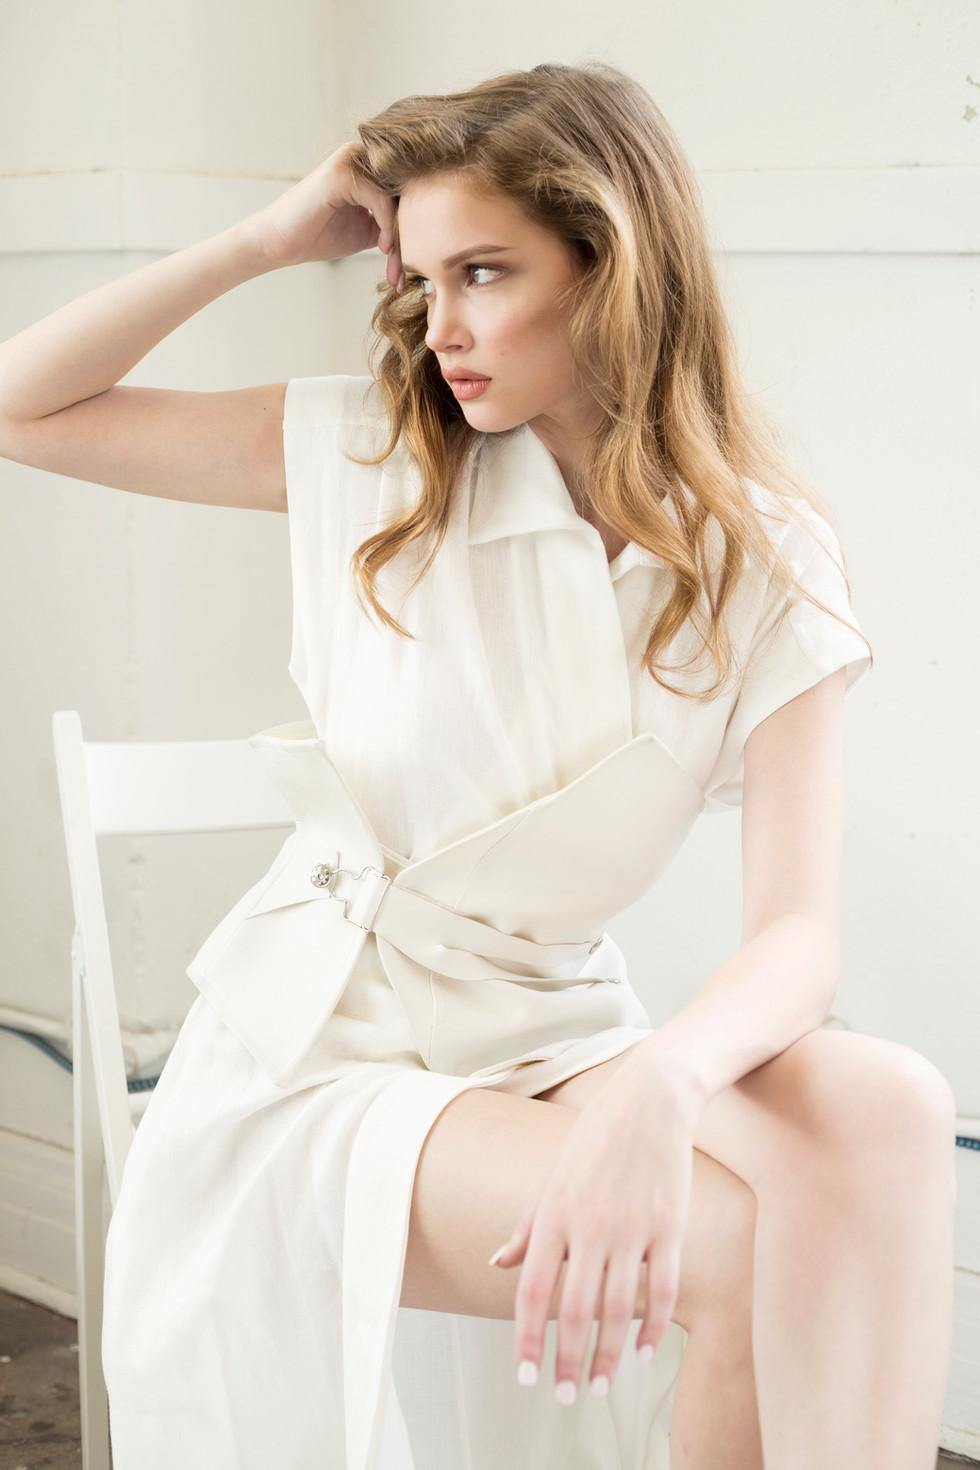 WHITE AFFAIR WITH PHOTOGRAPHERLIA HUOT